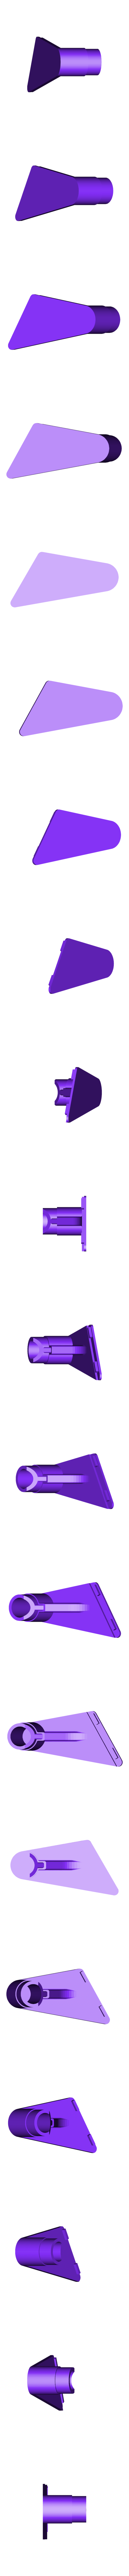 PanierRecyclage - SupportPoignee.stl Télécharger fichier STL gratuit Panier recyclage • Objet imprimable en 3D, mrballeure